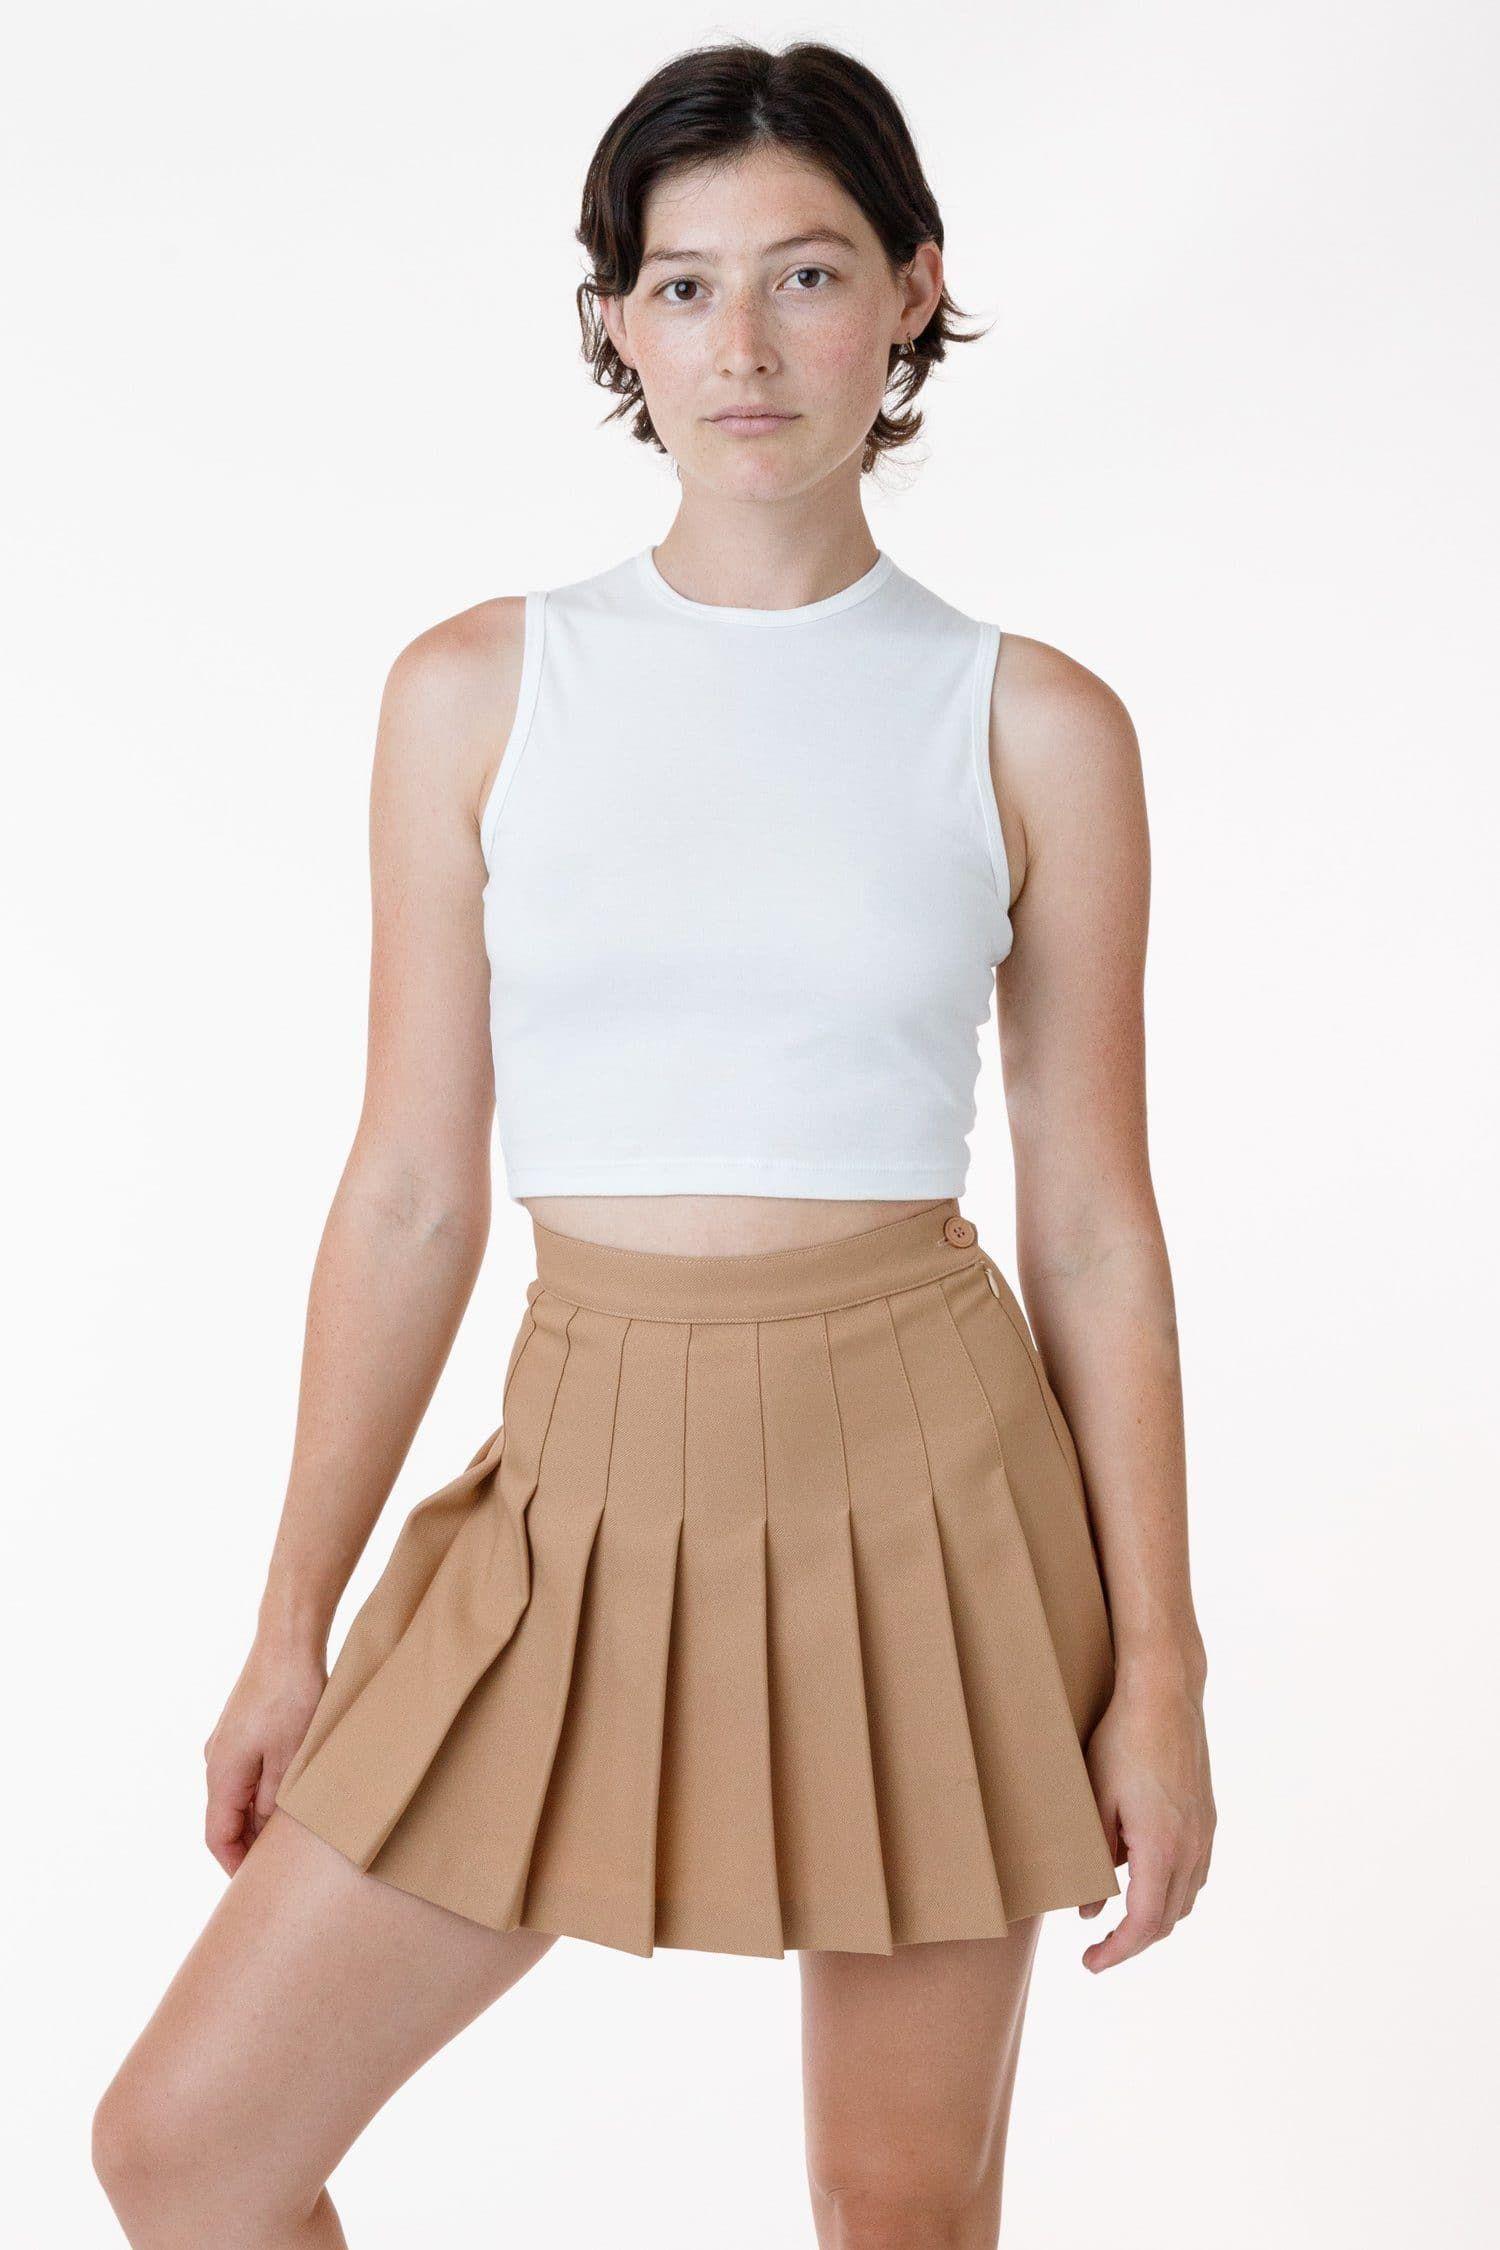 RGB300 - Tennis Skirt (Classic Colors) - Khaki / S